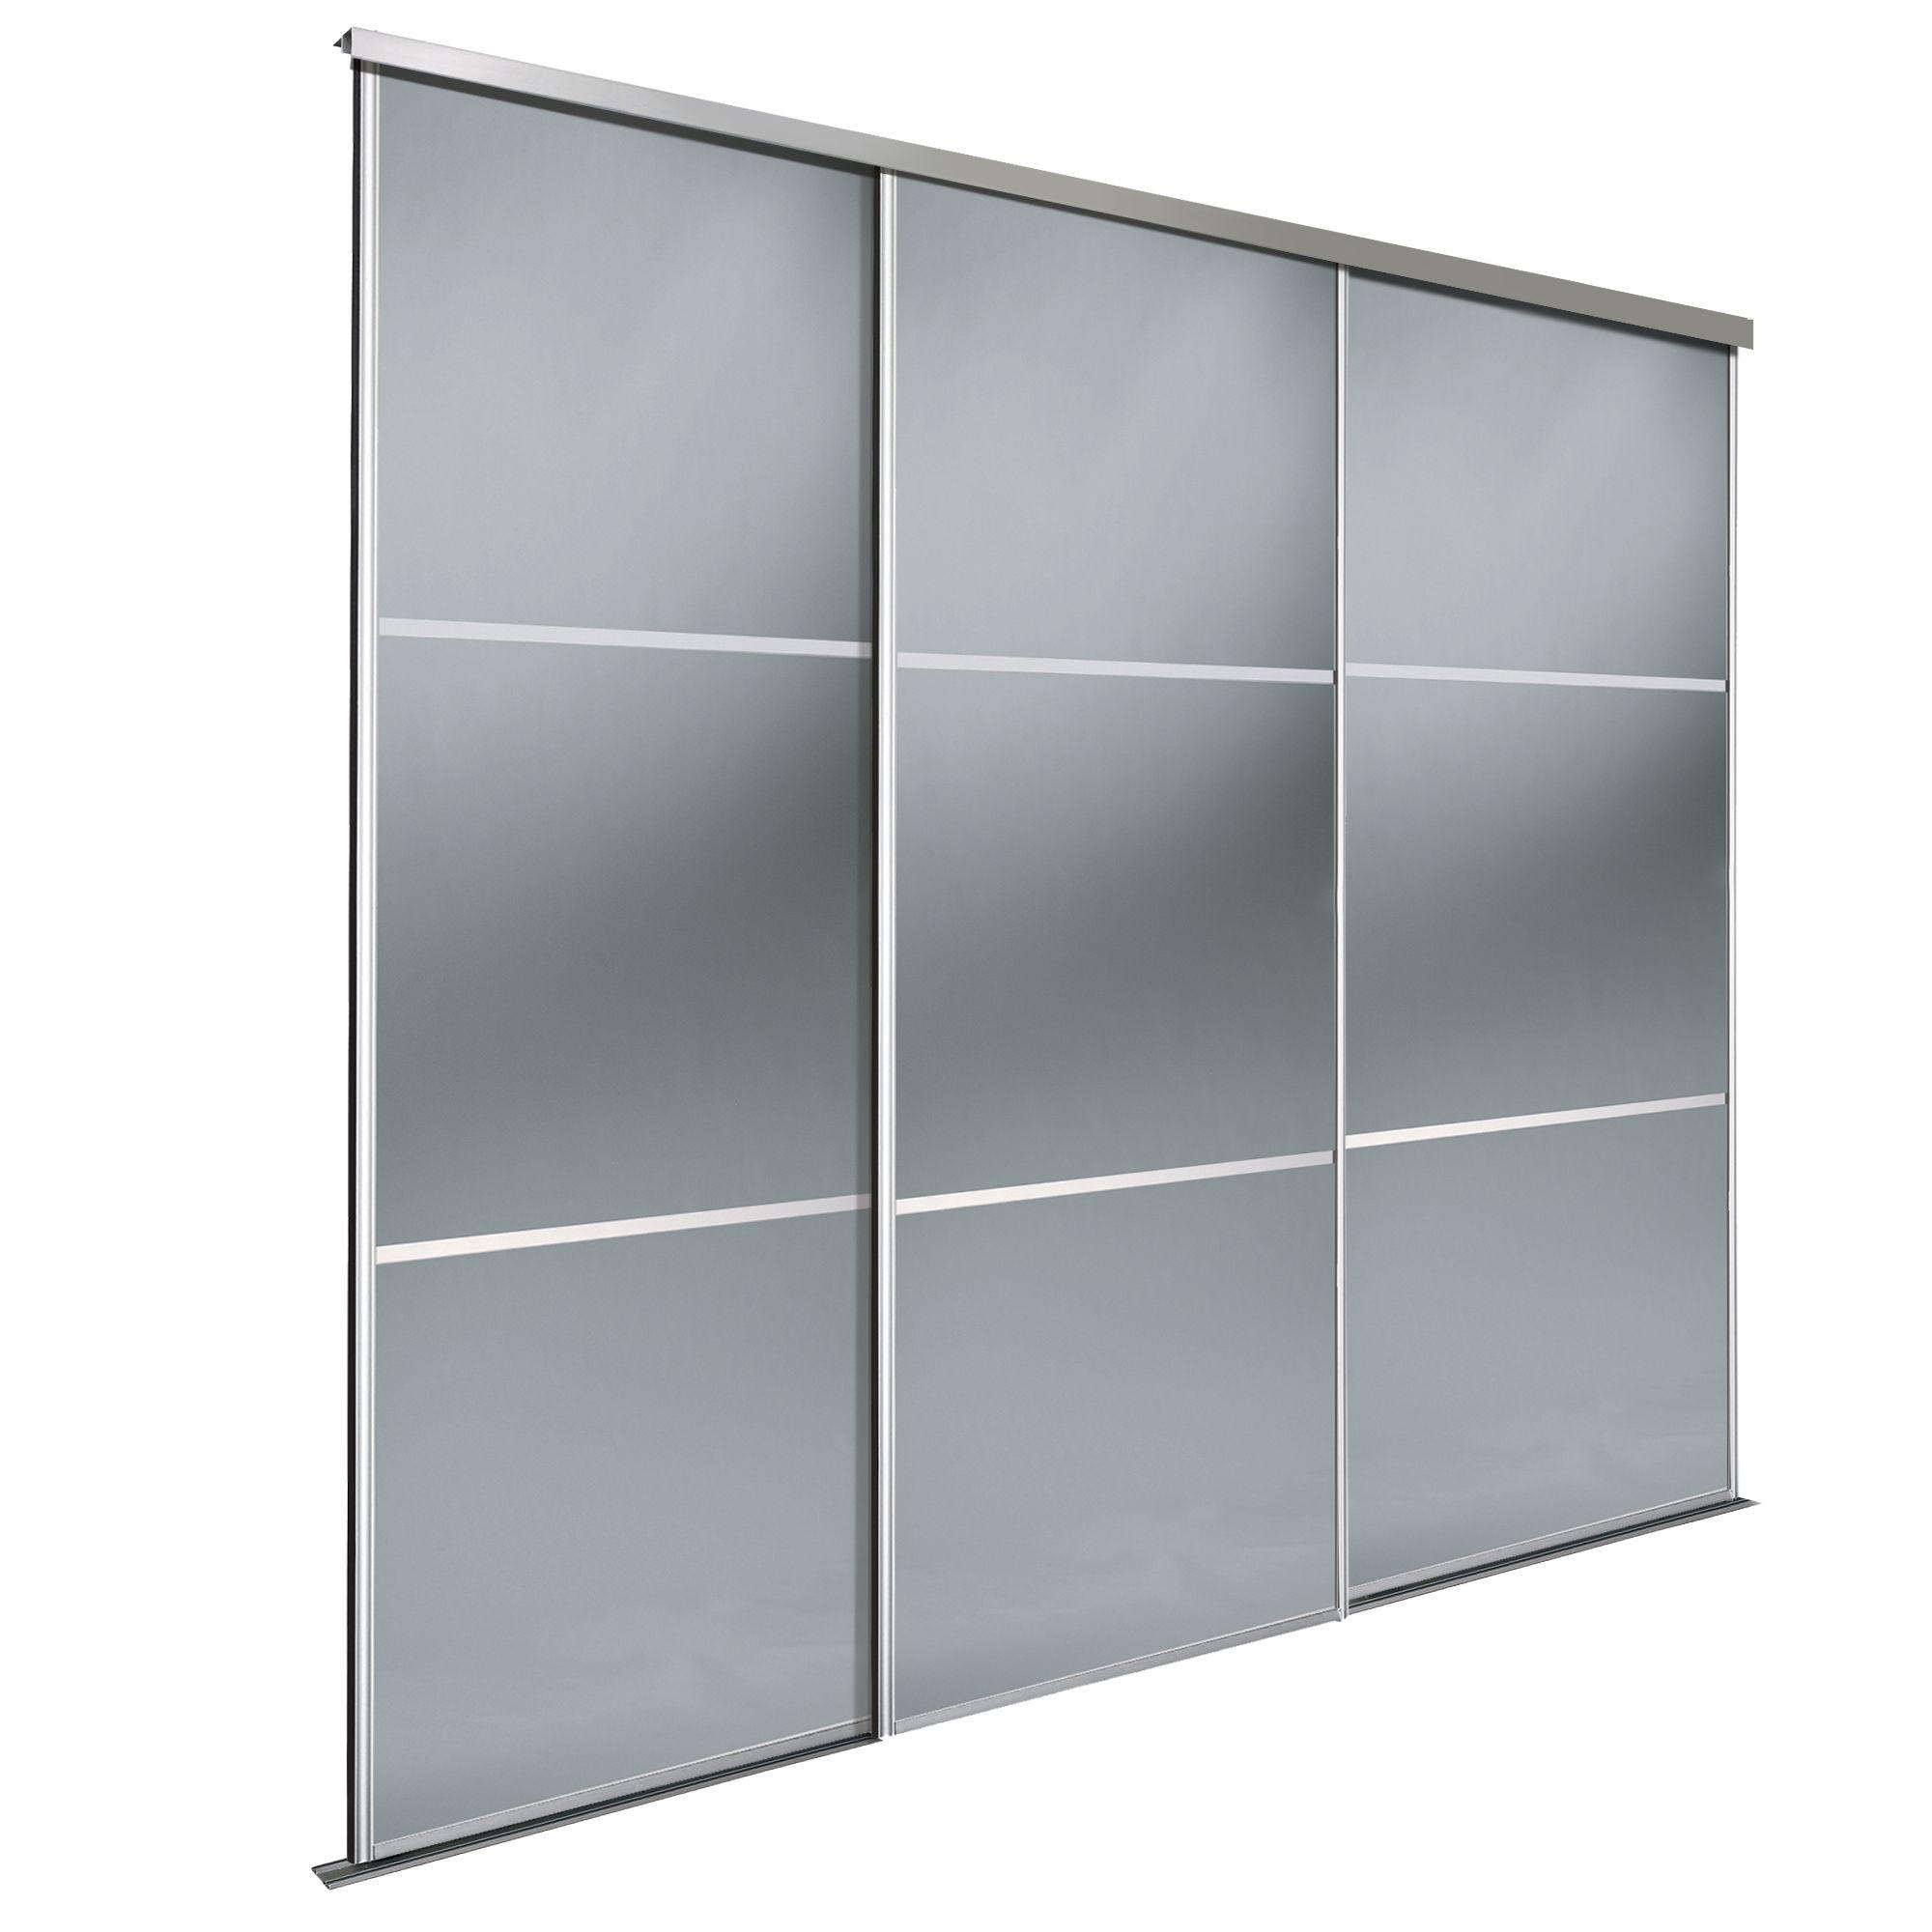 Premium Select Smoked Grey Mirror Sliding Wardrobe Door Kit (h)2220 Mm (w)914 Mm, Pack Of 3